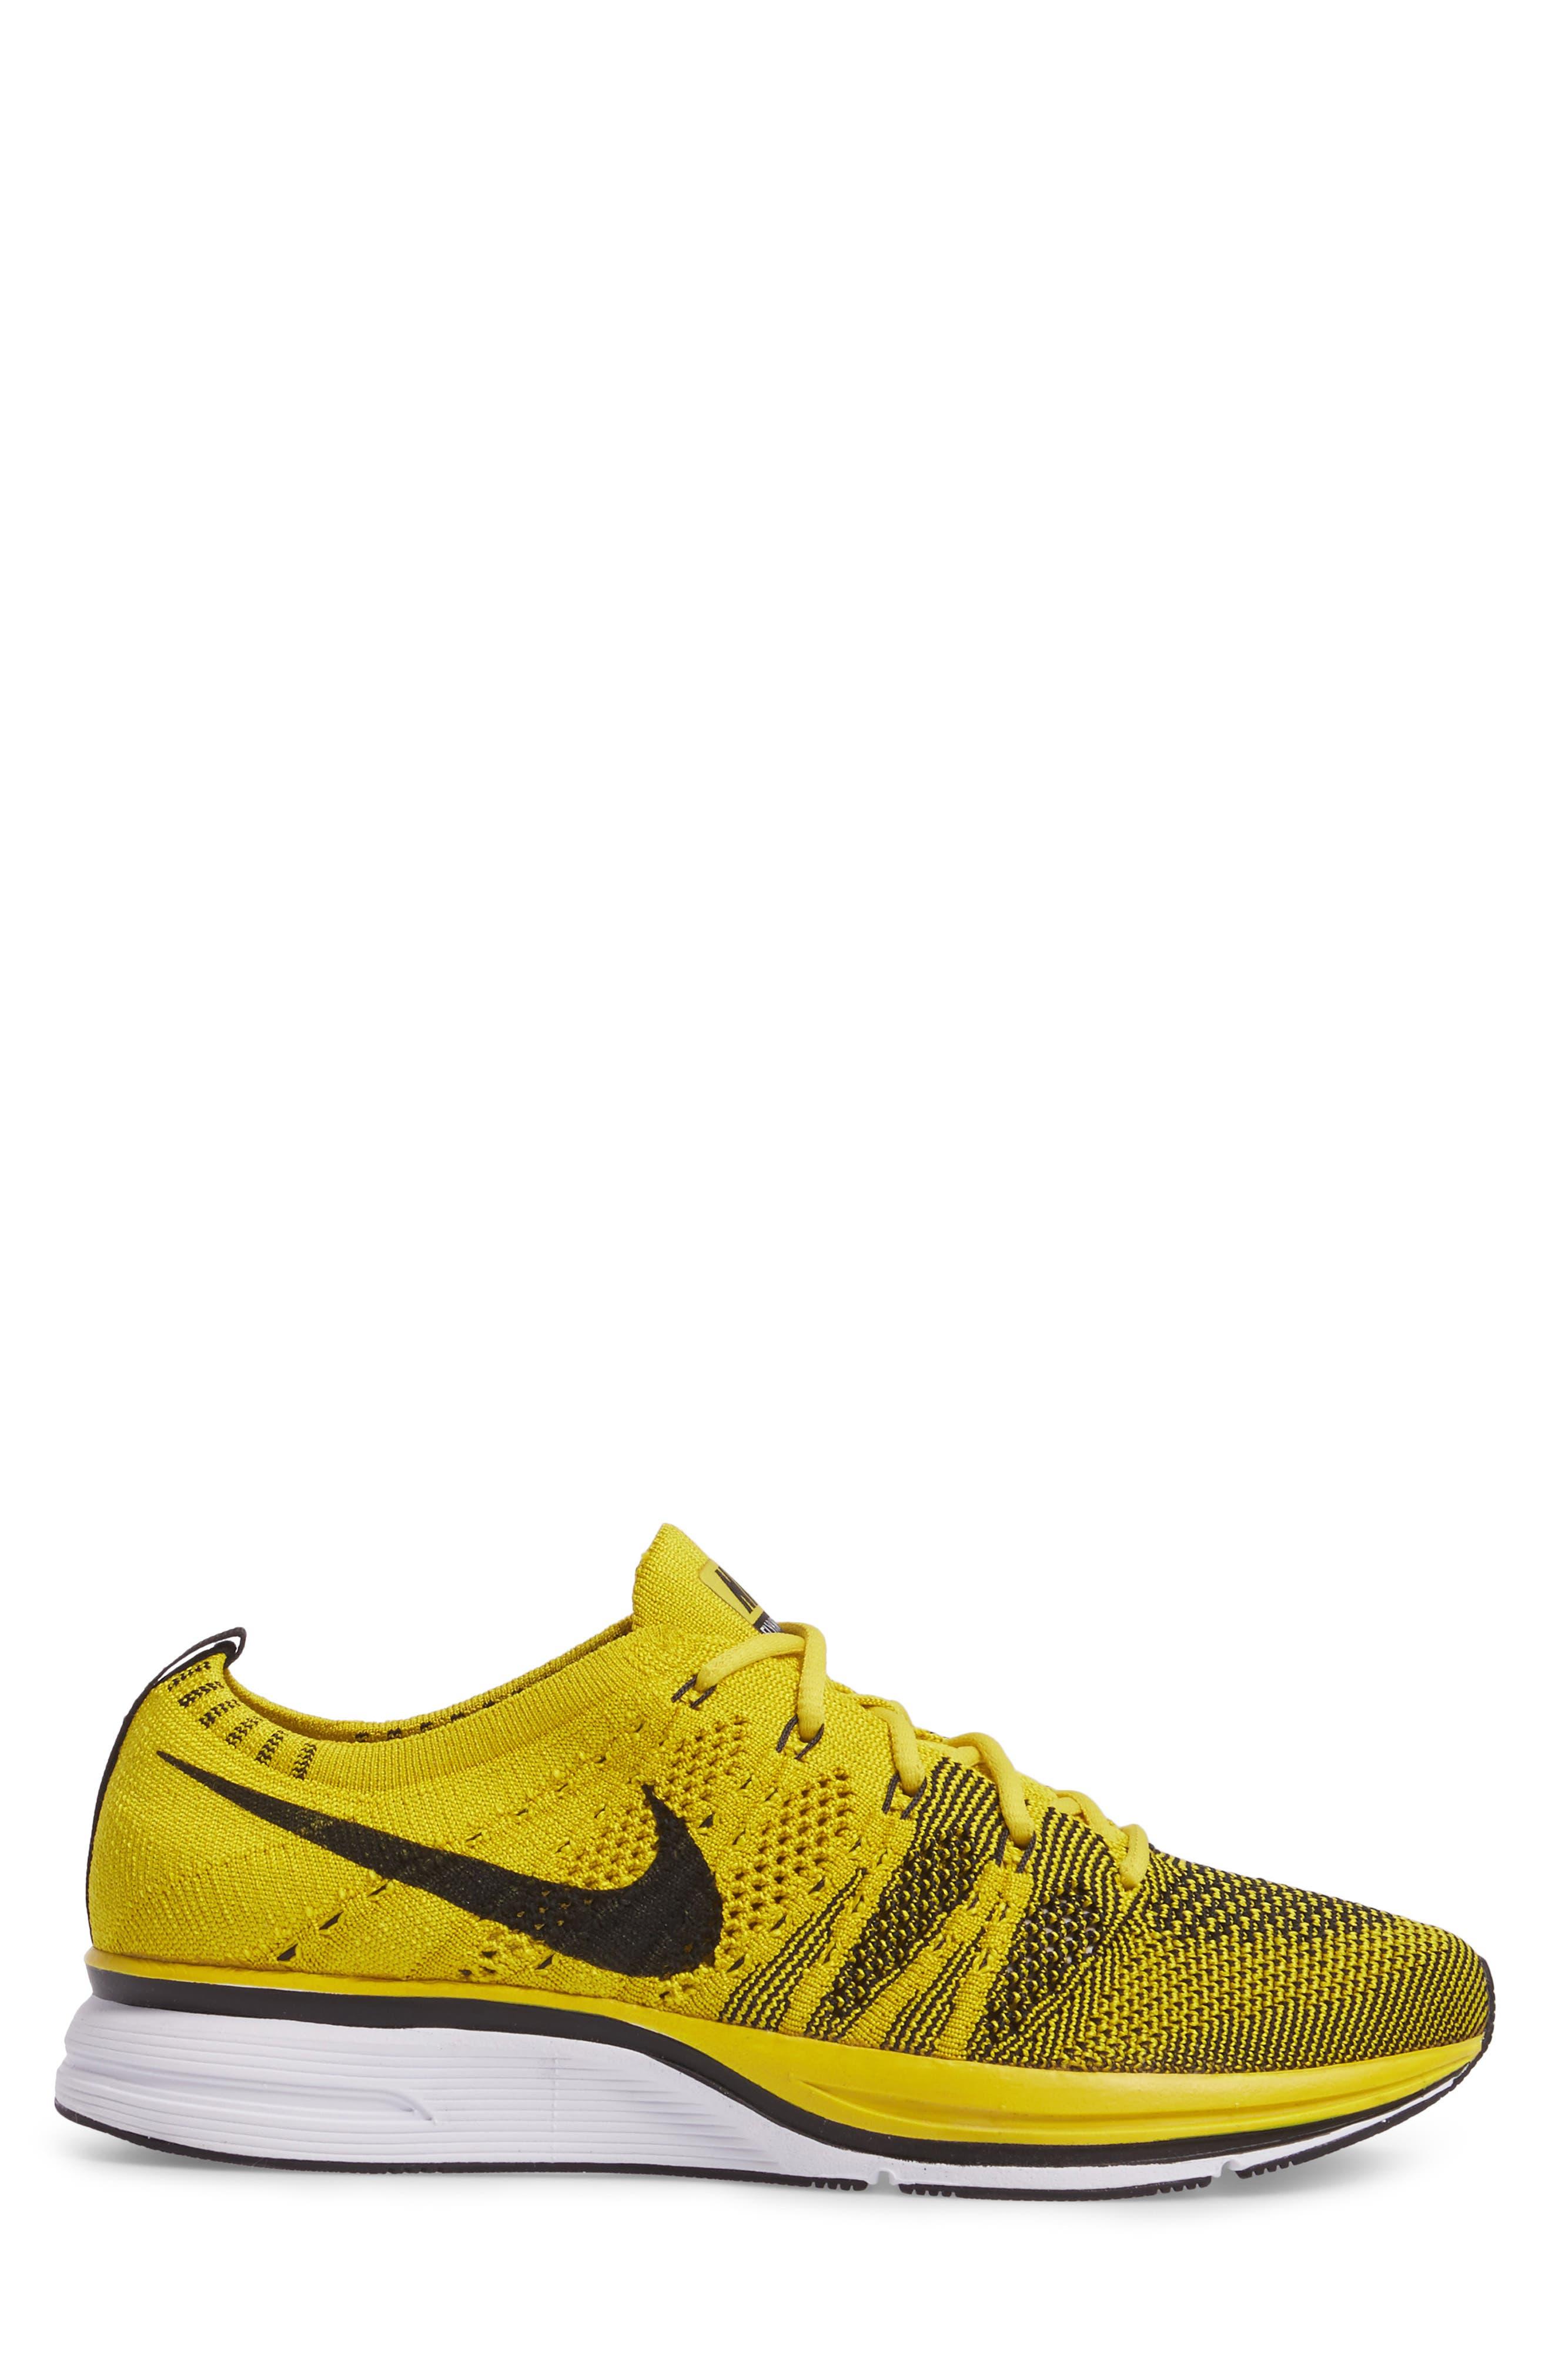 NikeLab Flyknit Trainer Sneaker,                             Alternate thumbnail 3, color,                             Bright Citron/ Black/ White